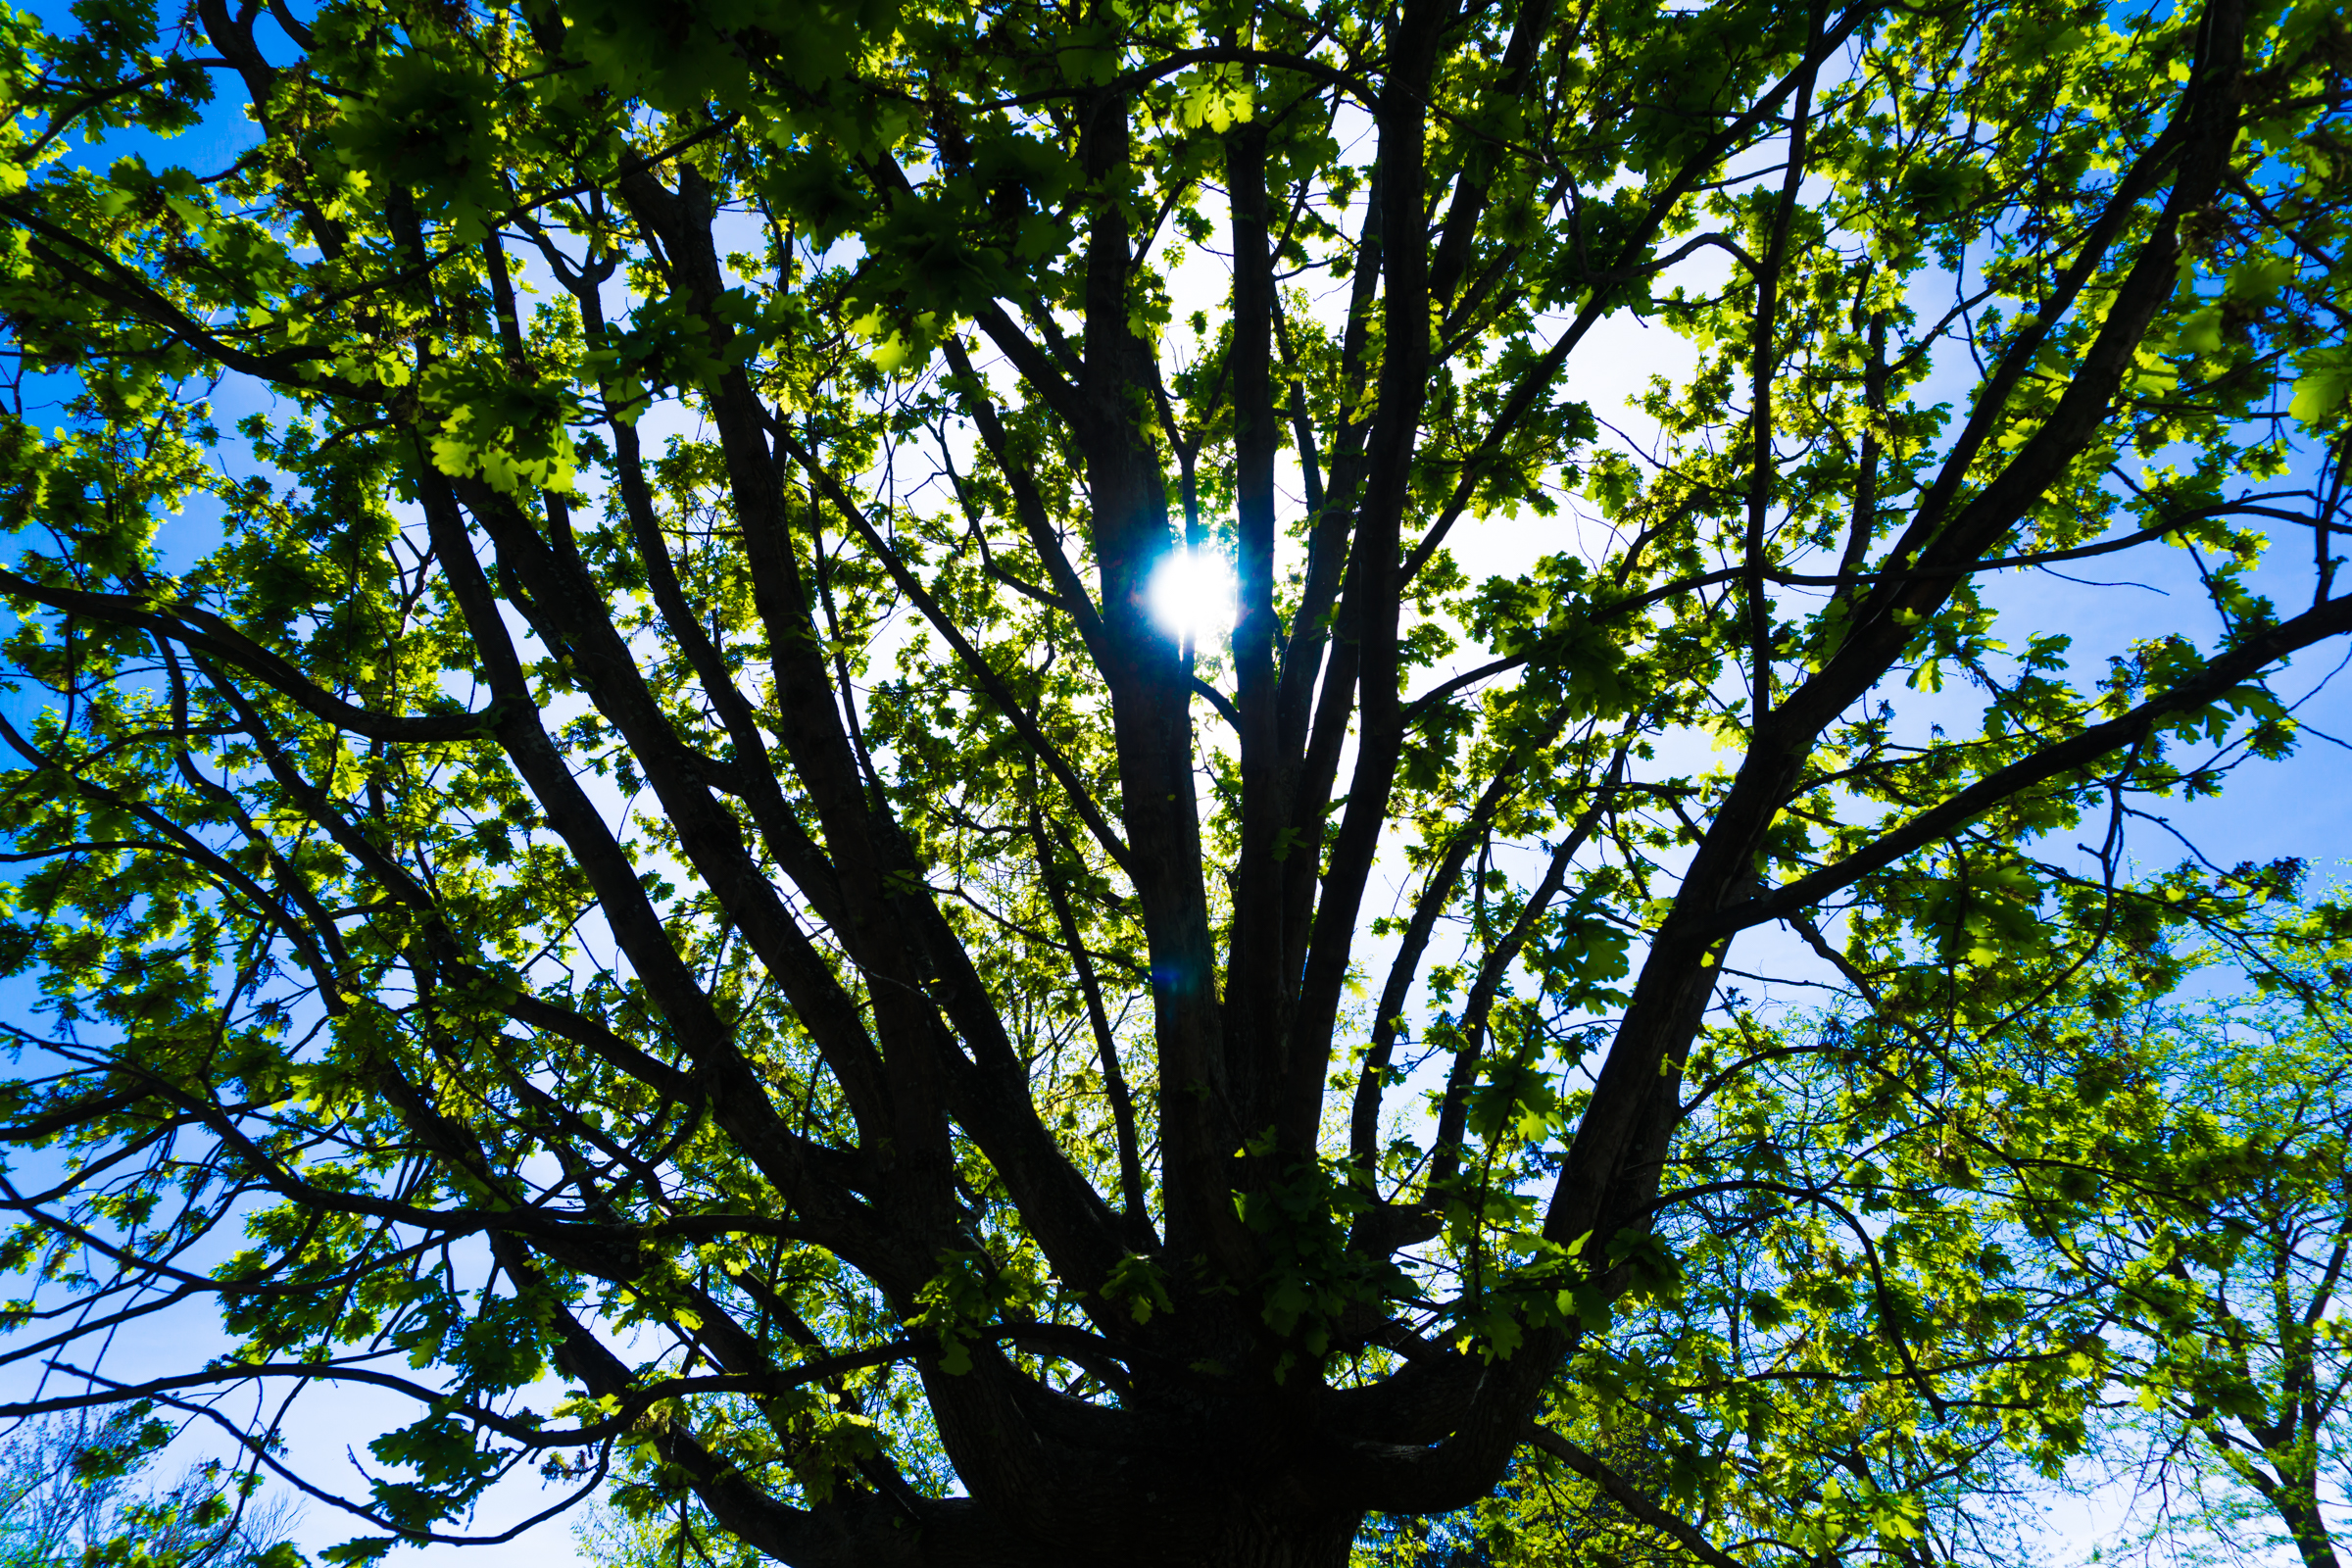 April 24th: Tree